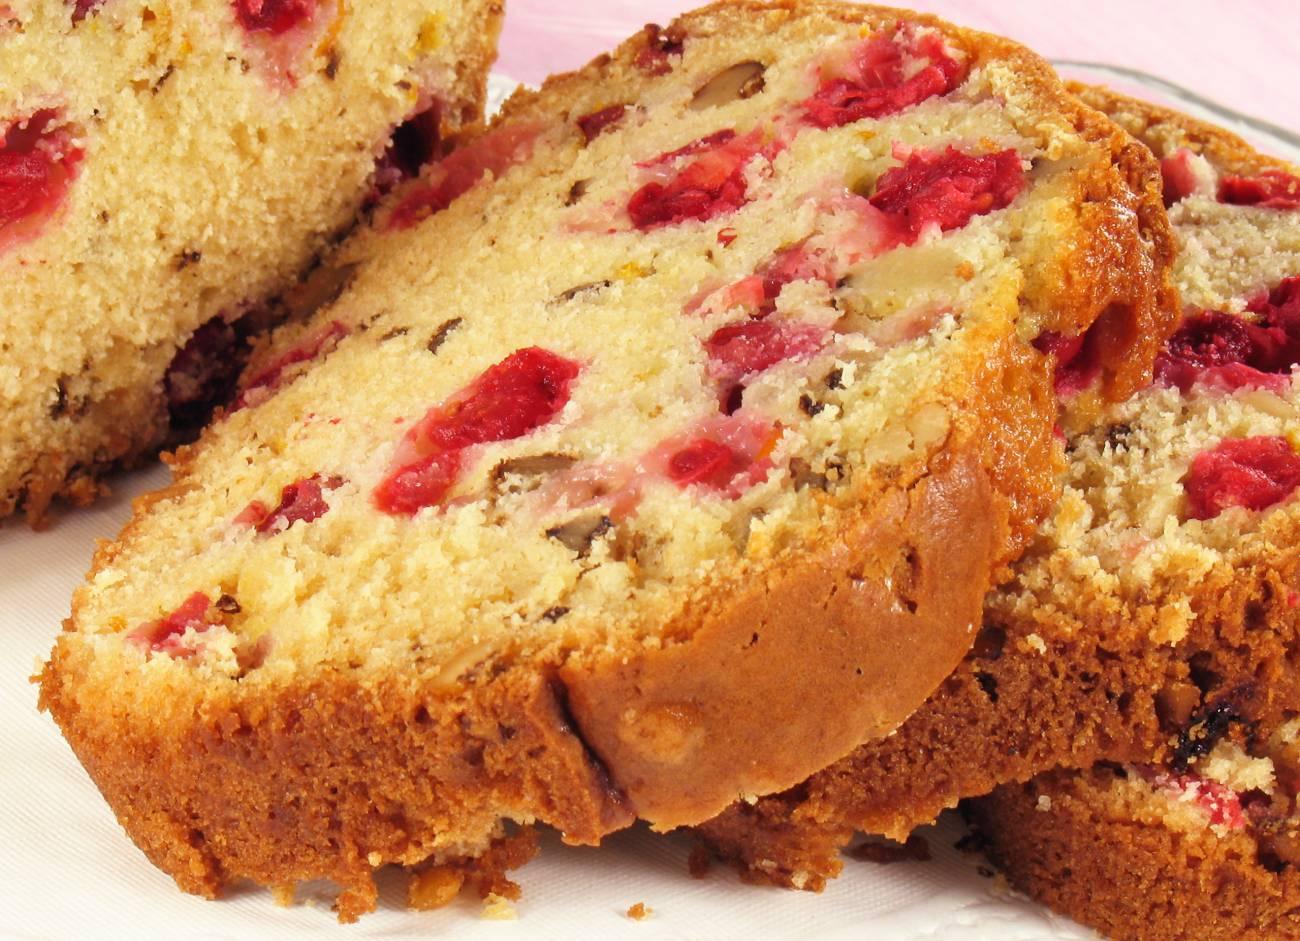 Cranberry Orange Cake/Loaf Recipe